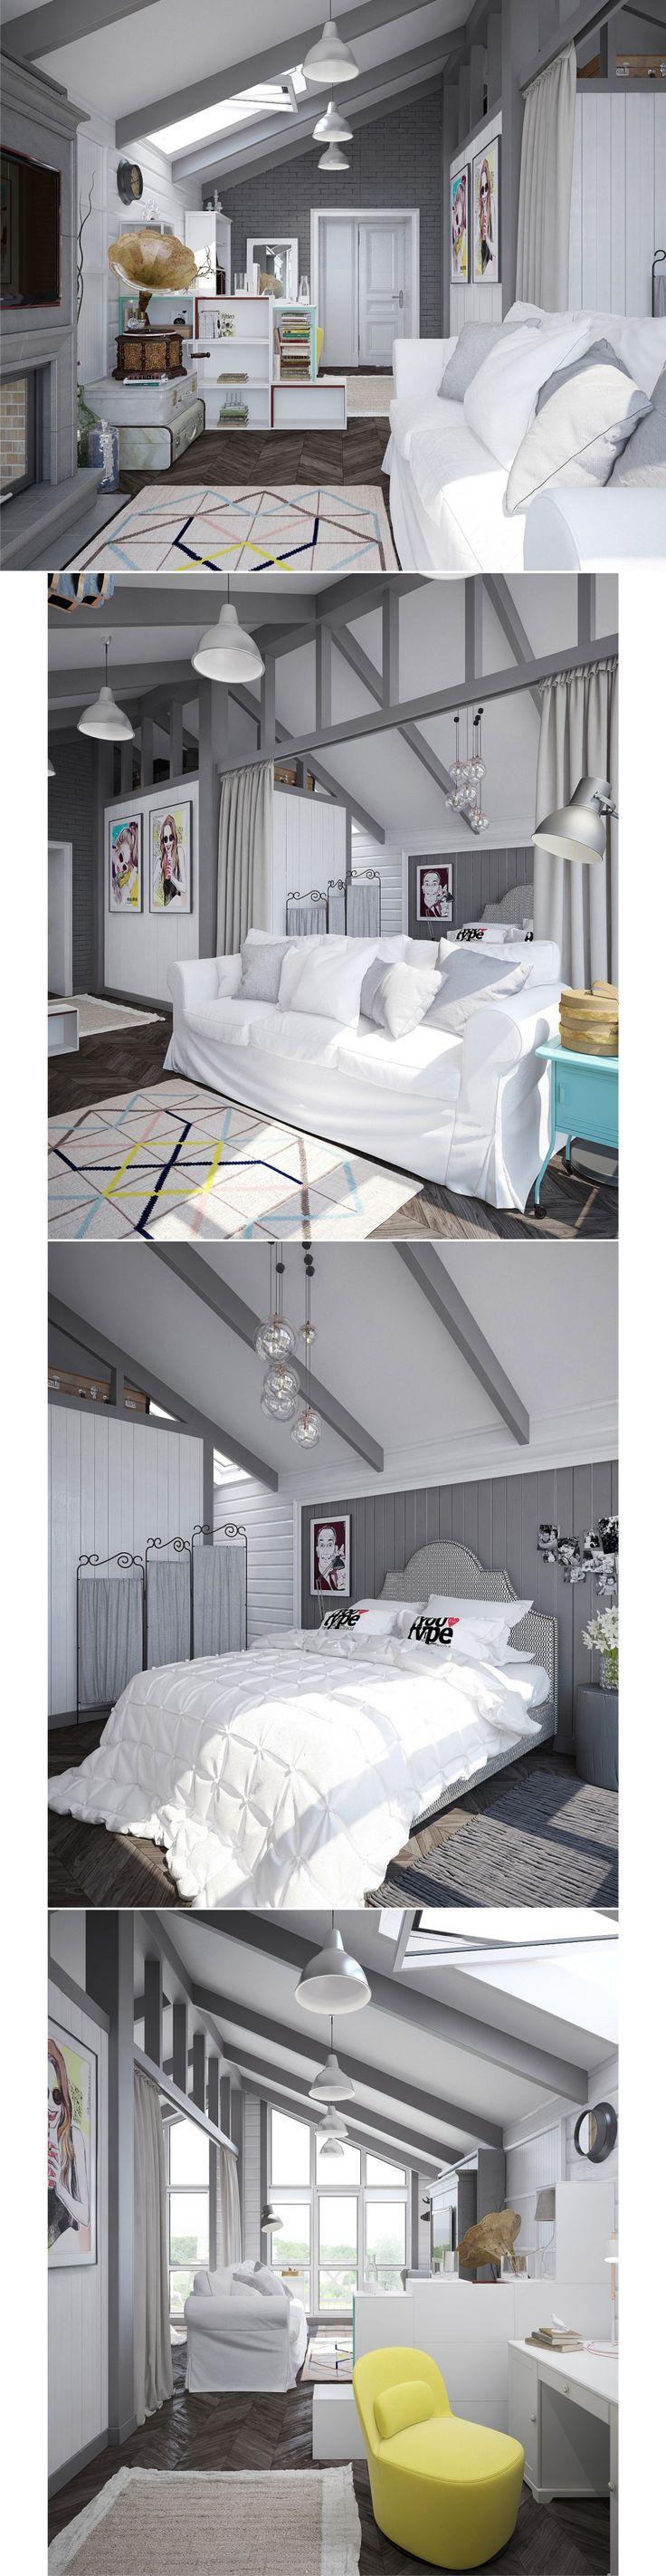 комната для девочки подростка - Галерея 3ddd.ru